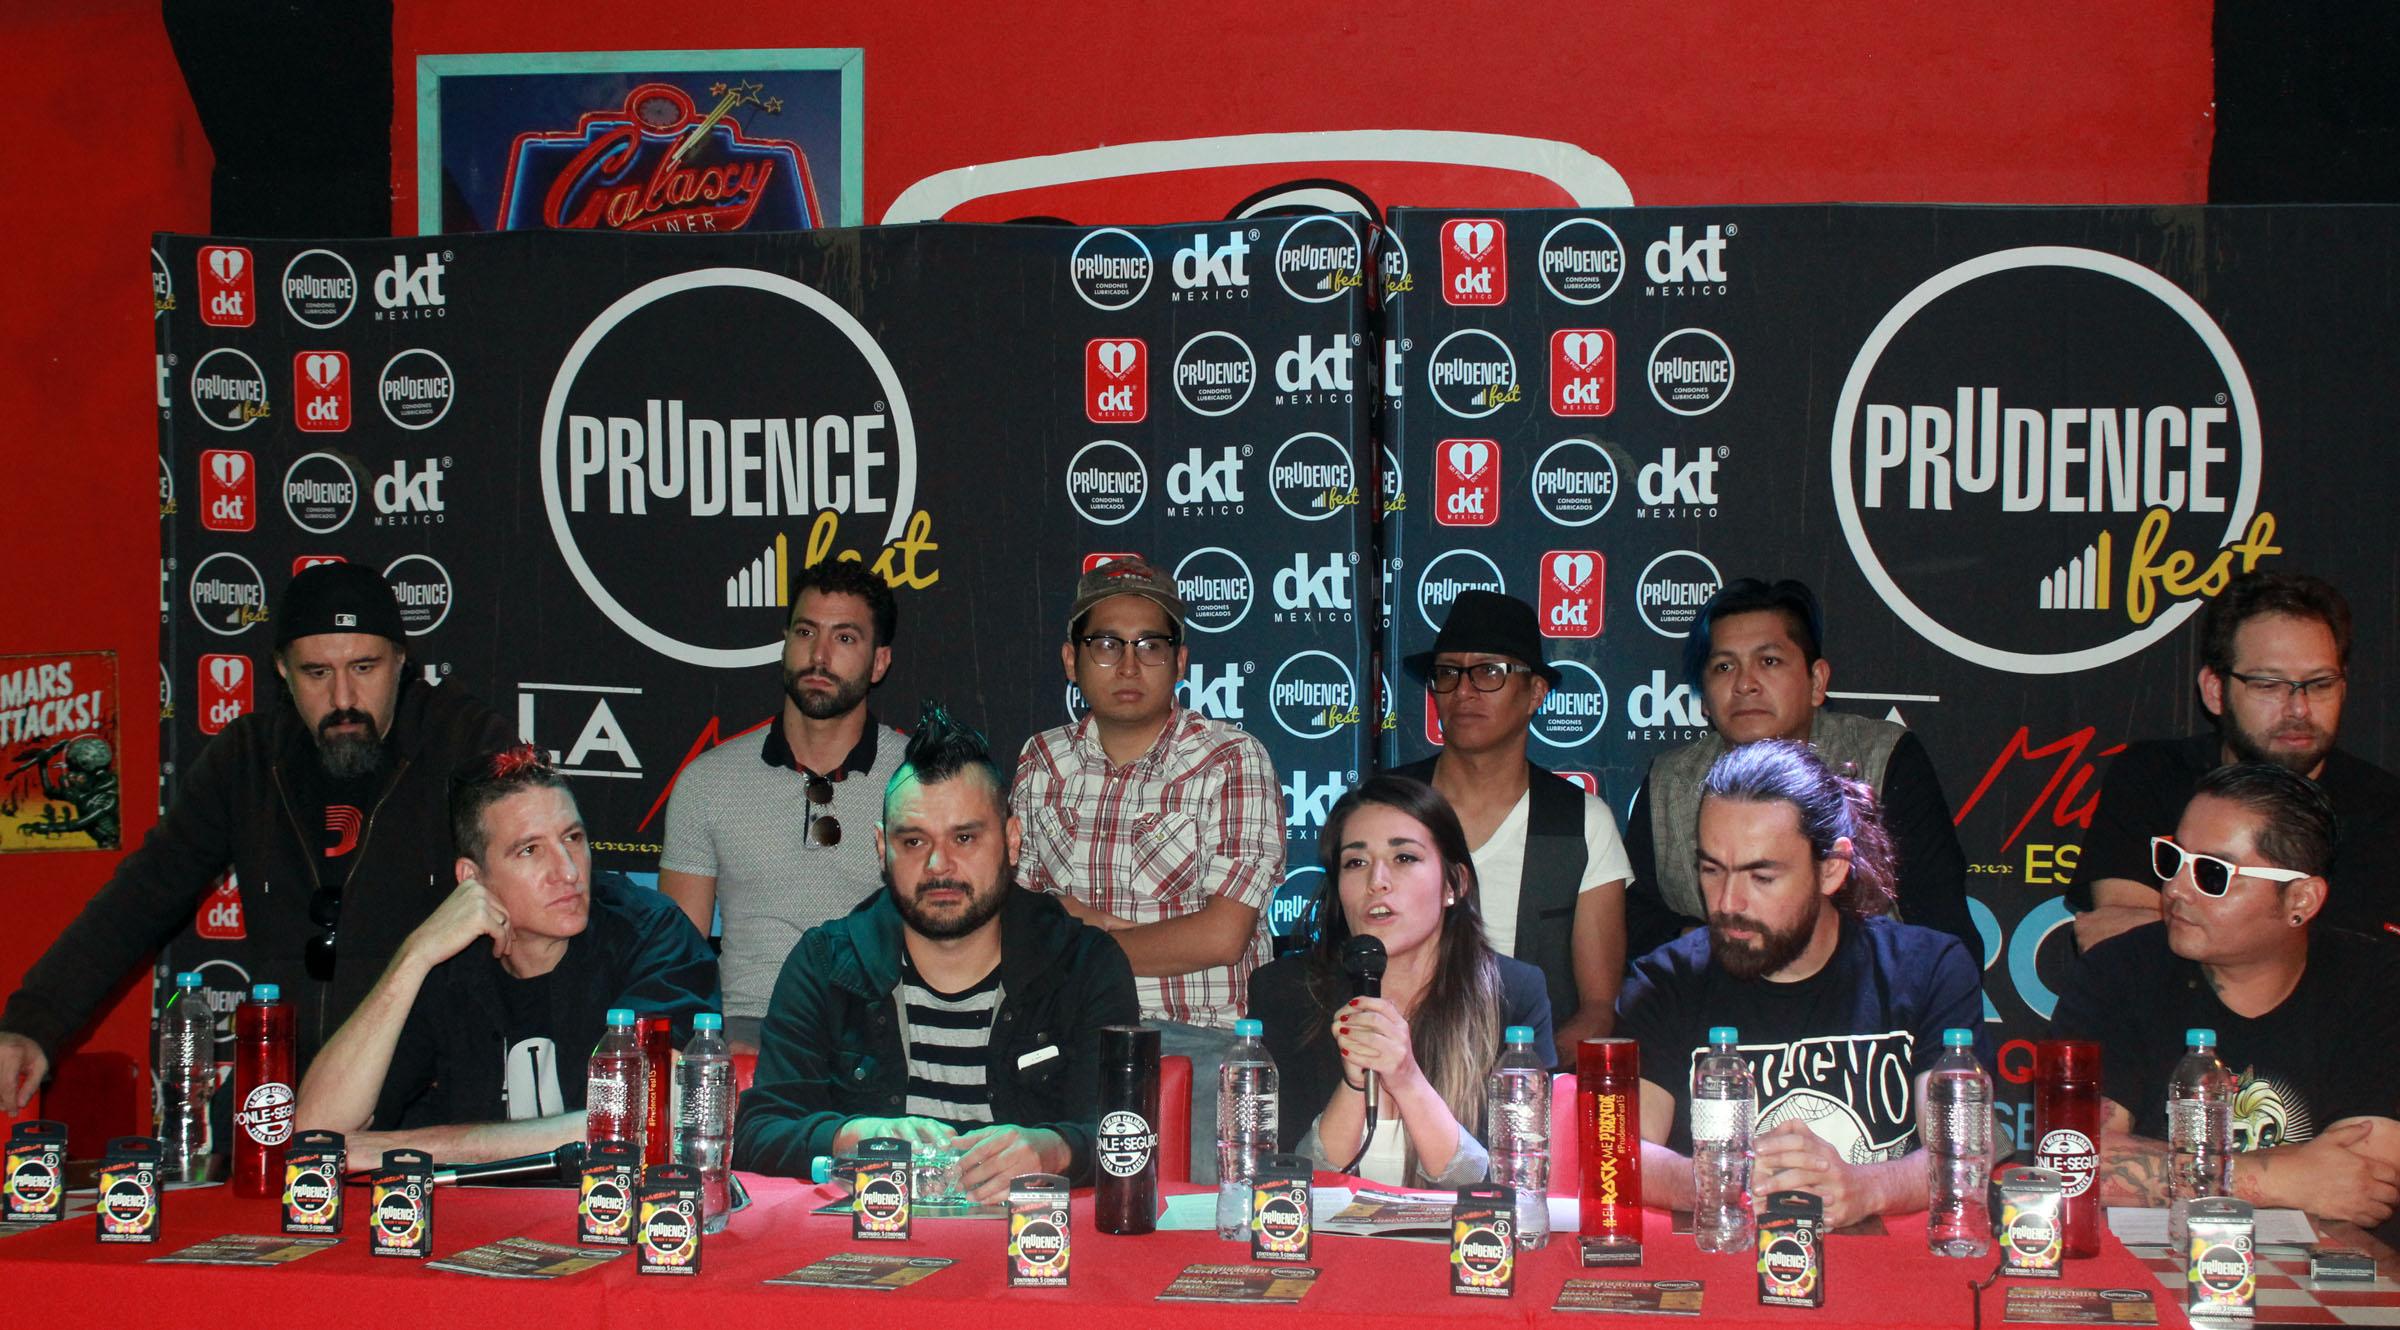 Prudence Fest 2015 Confe 2